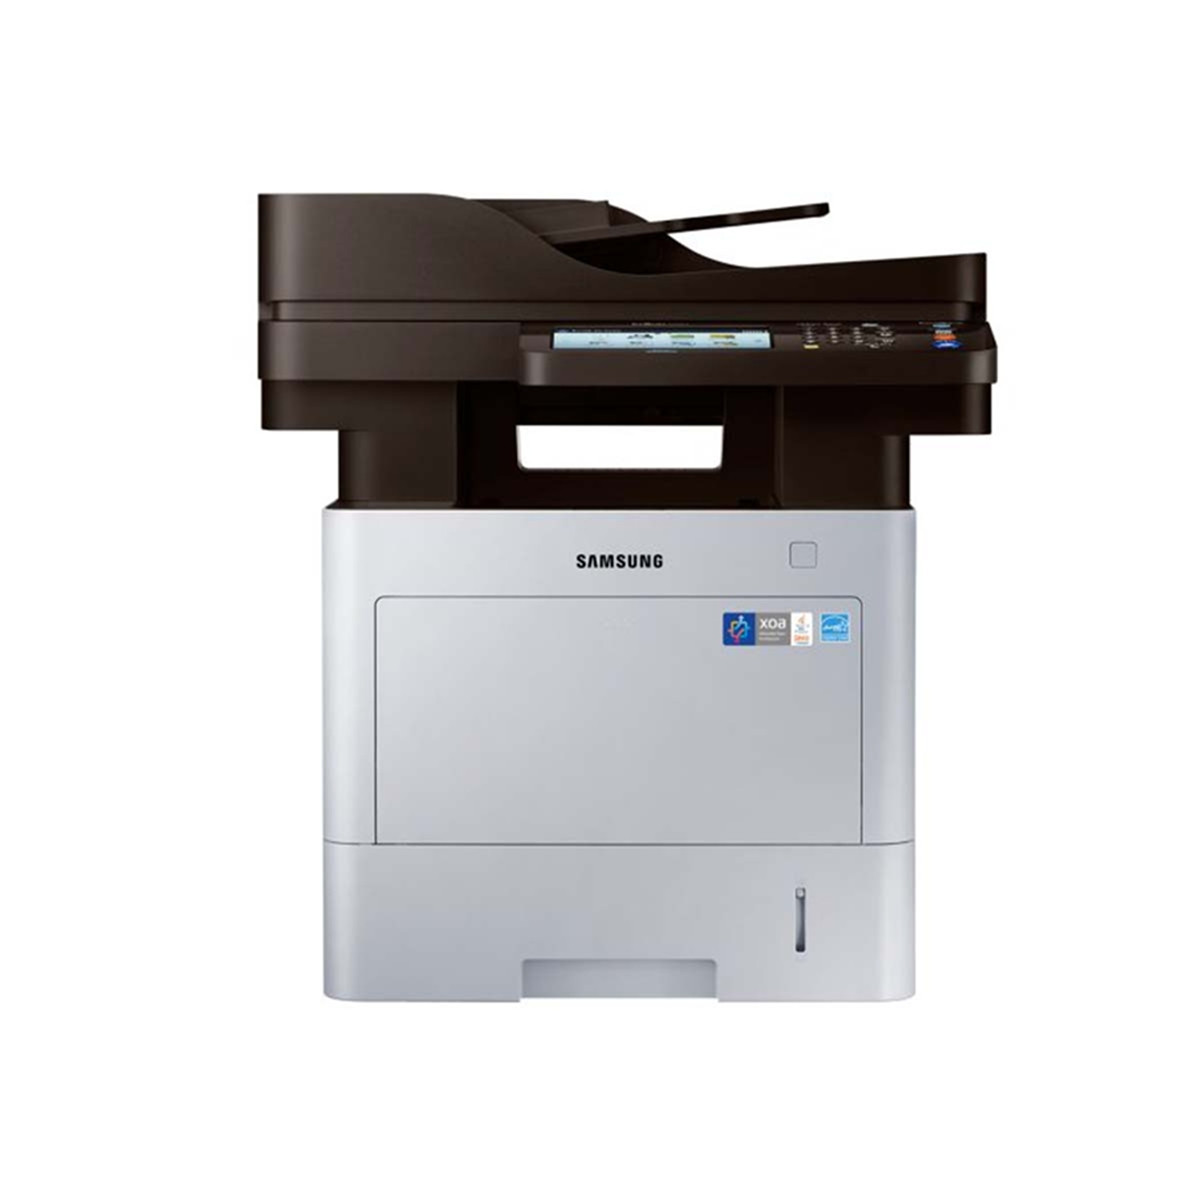 Impressora Samsung M4080FX M4080 SL-M4080FX | Monocromática Multifuncional ProXpress